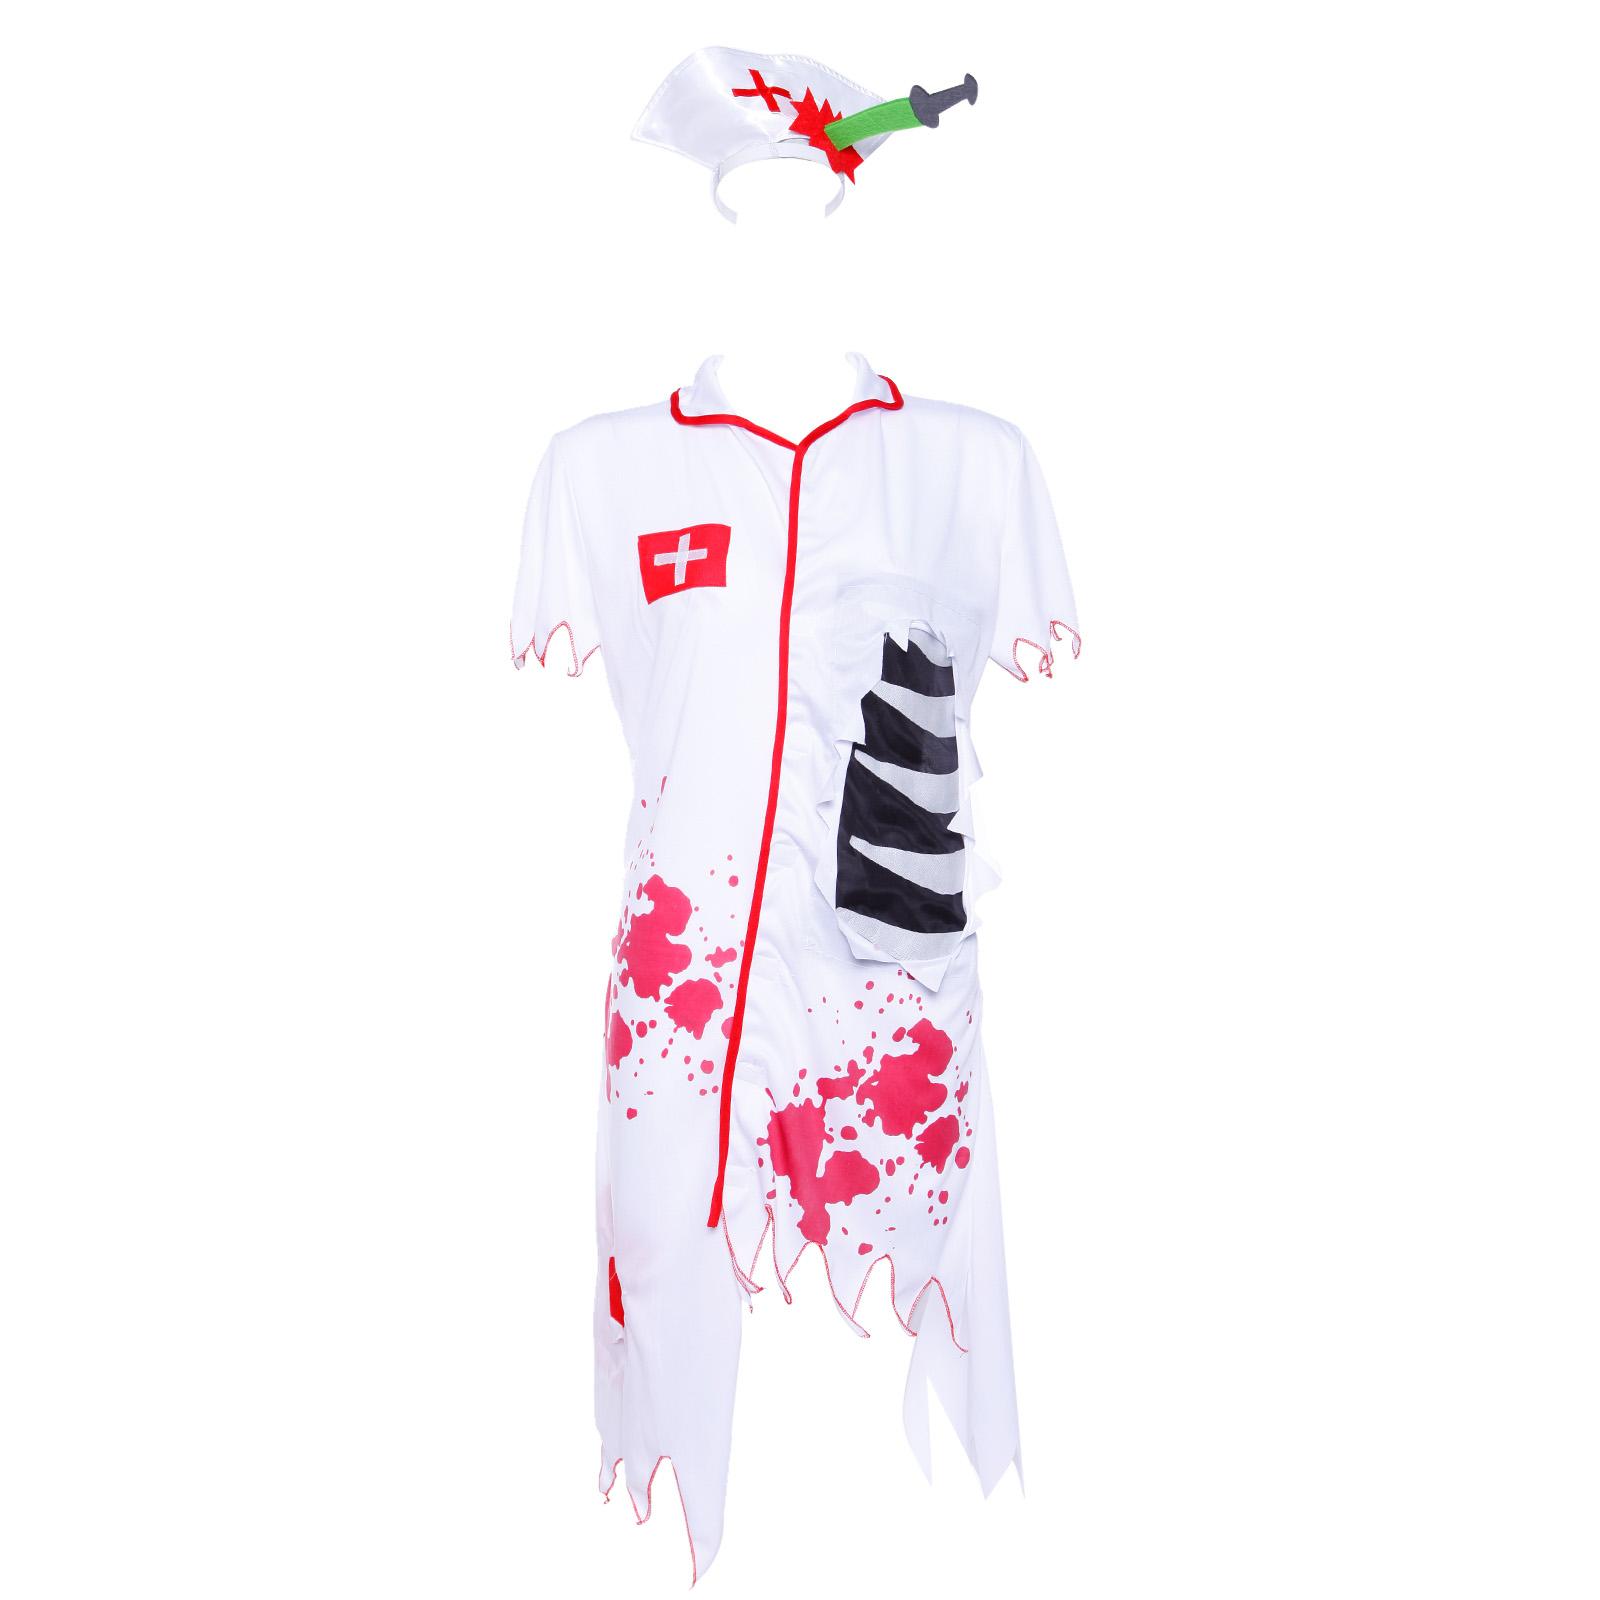 La s Zombie Nurse Horror Fancy Dress Halloween Costume Party Dress Up Outfit